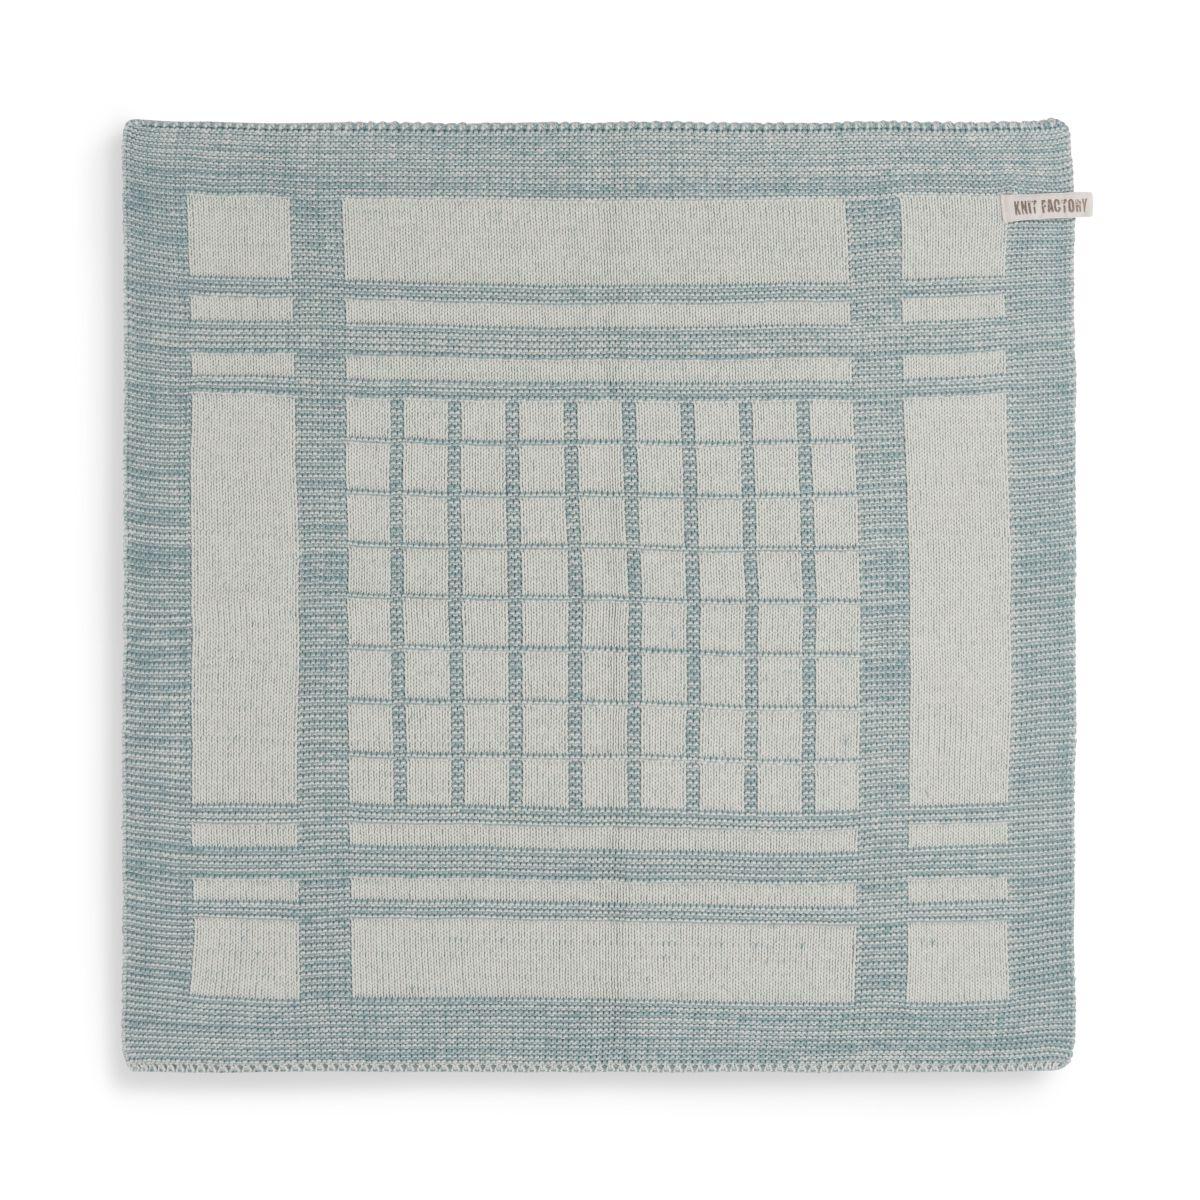 knit factory 2180076 keukendoek emma ecru stone green 1